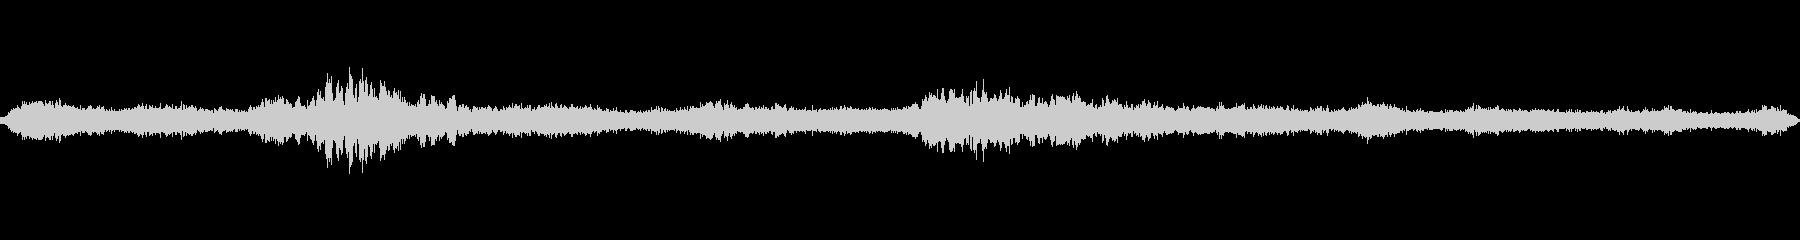 Steam Scare-Noise...の未再生の波形